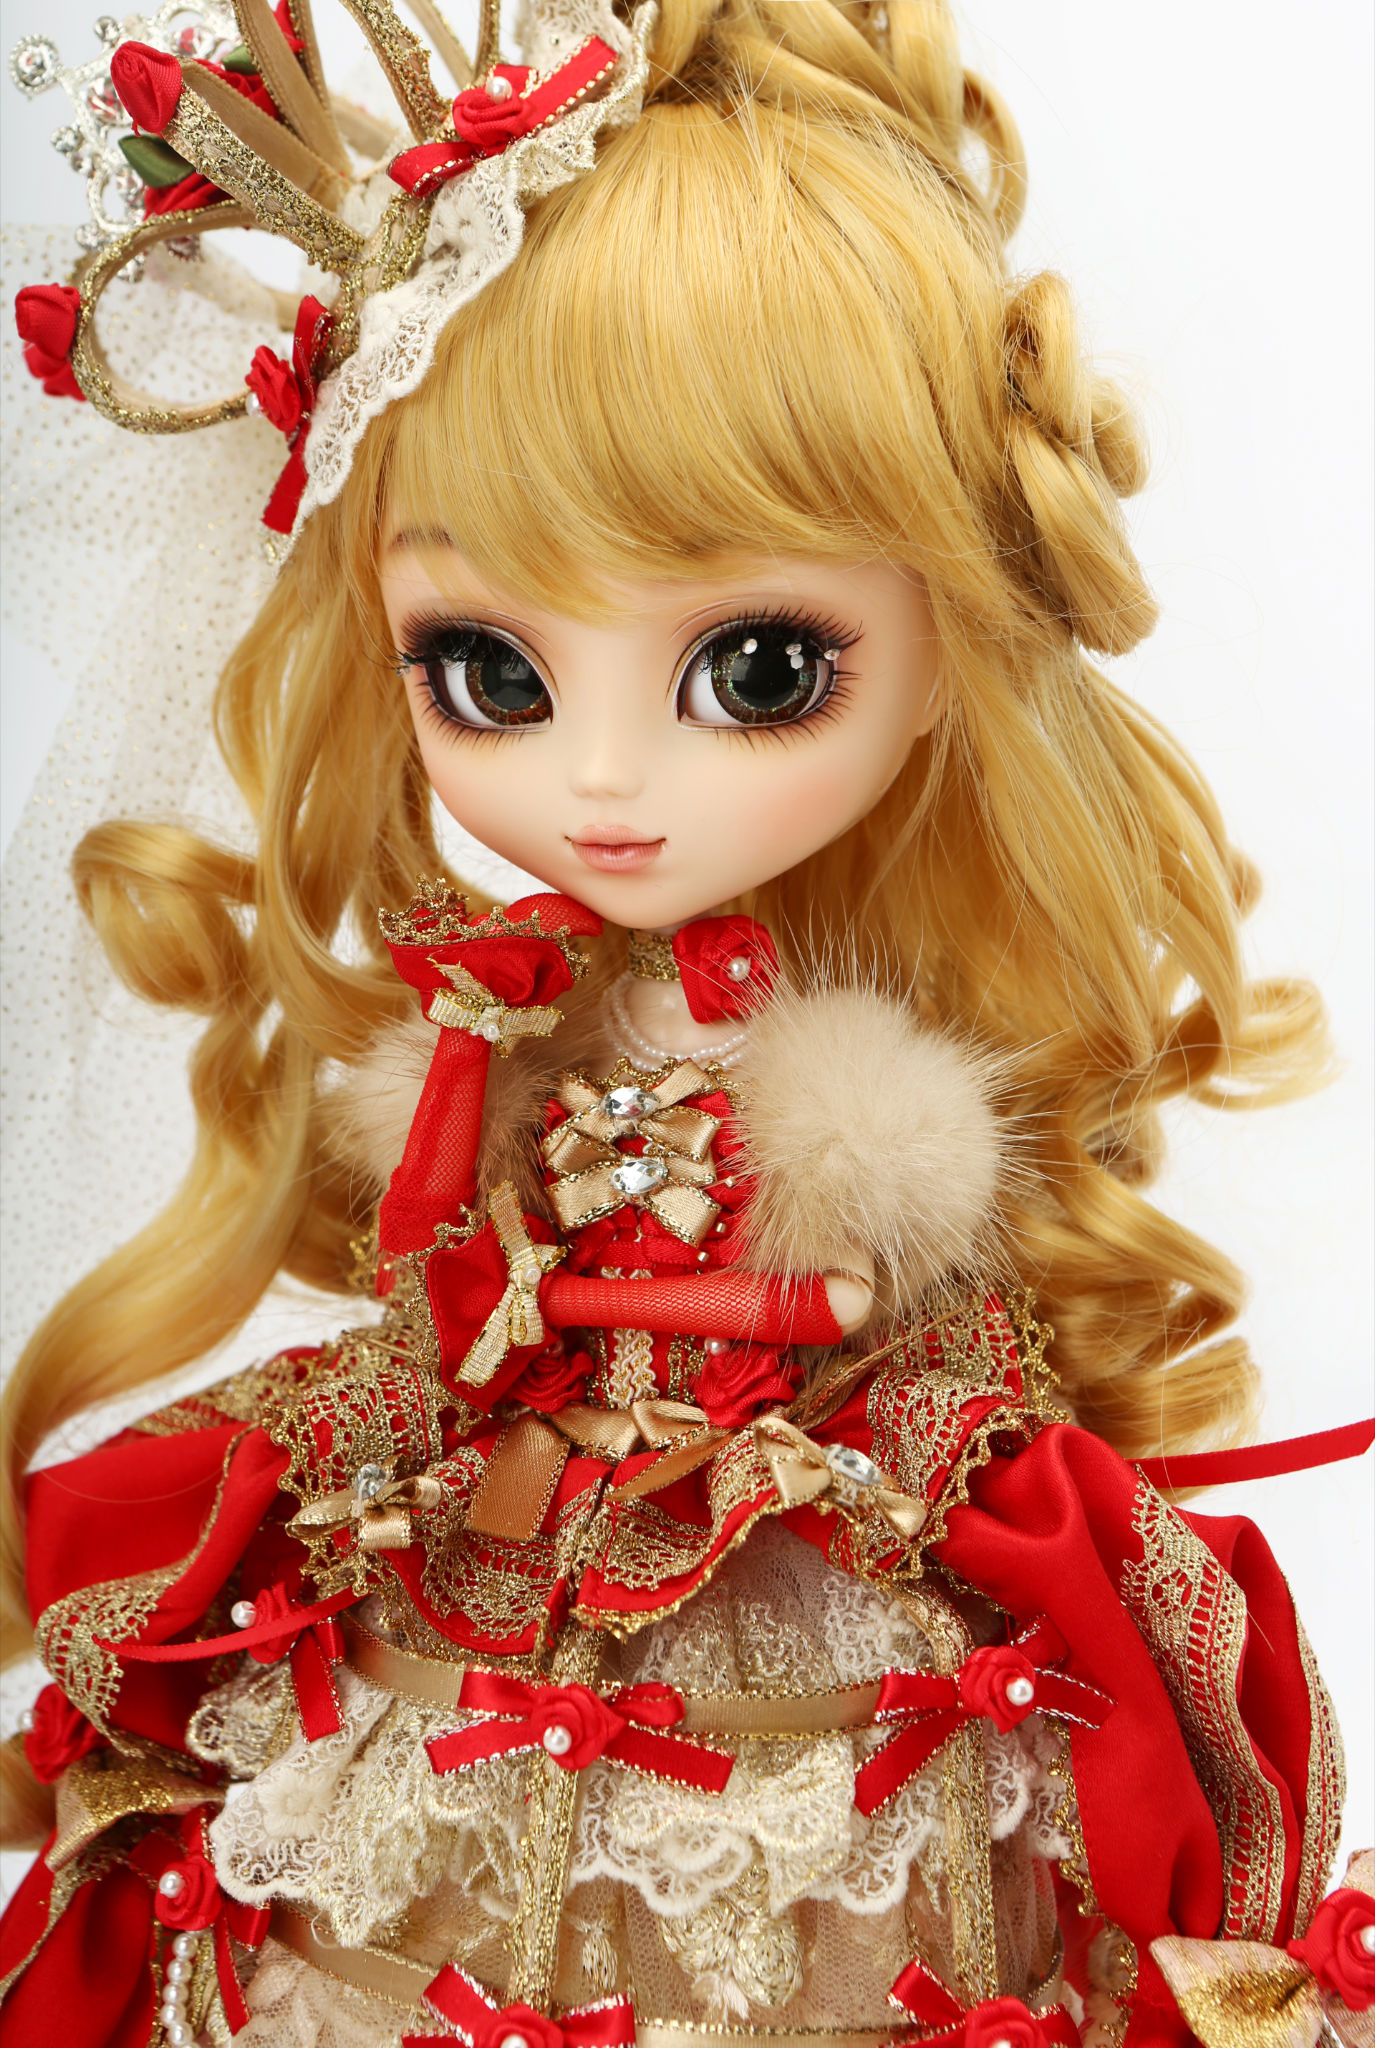 P-088 Pullip Princess Rosalind Doll Groove We Pullip 10th ...